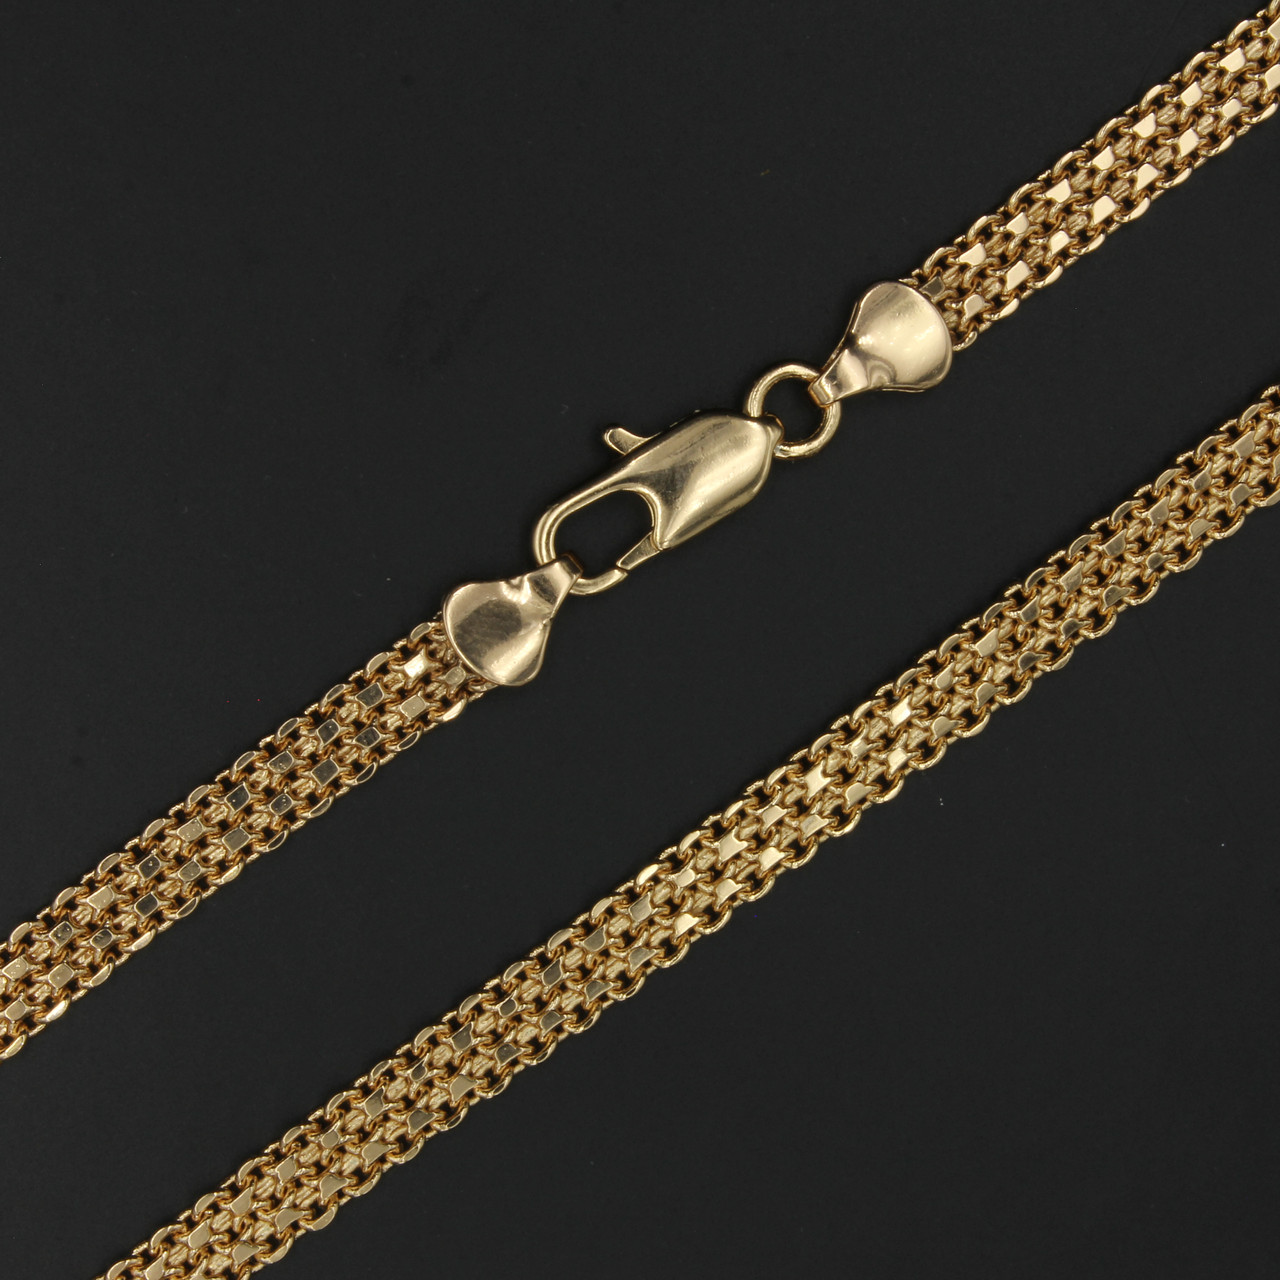 Ланцюг Бісмарк-60, плетення бісмарк, 60см